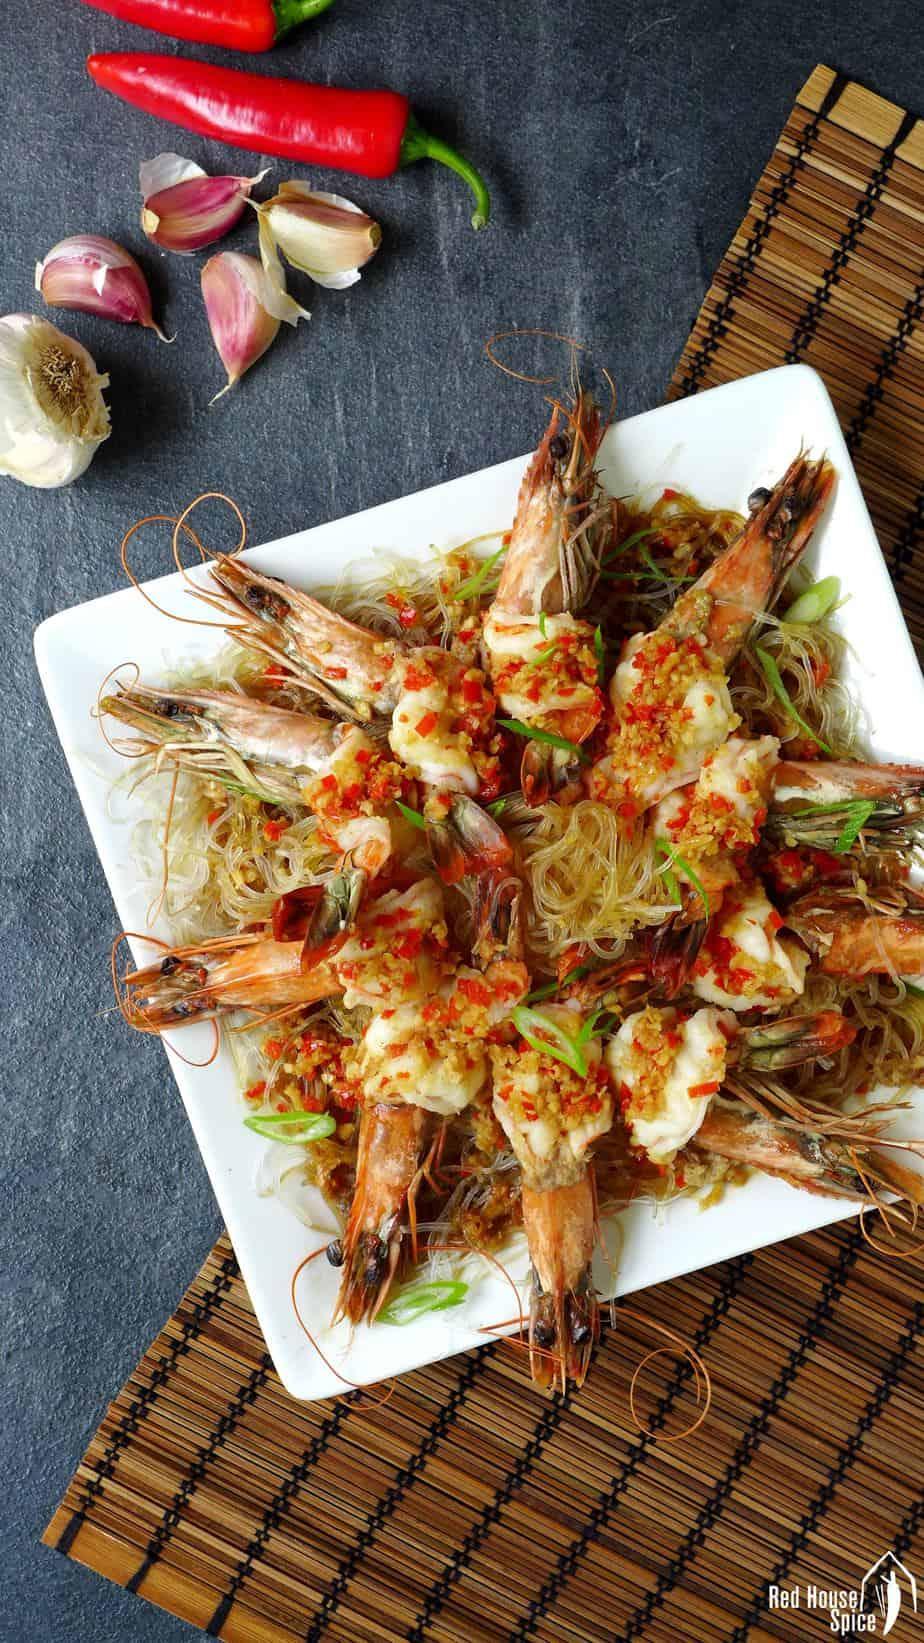 Steamed garlic prawns with vermicelli noodles